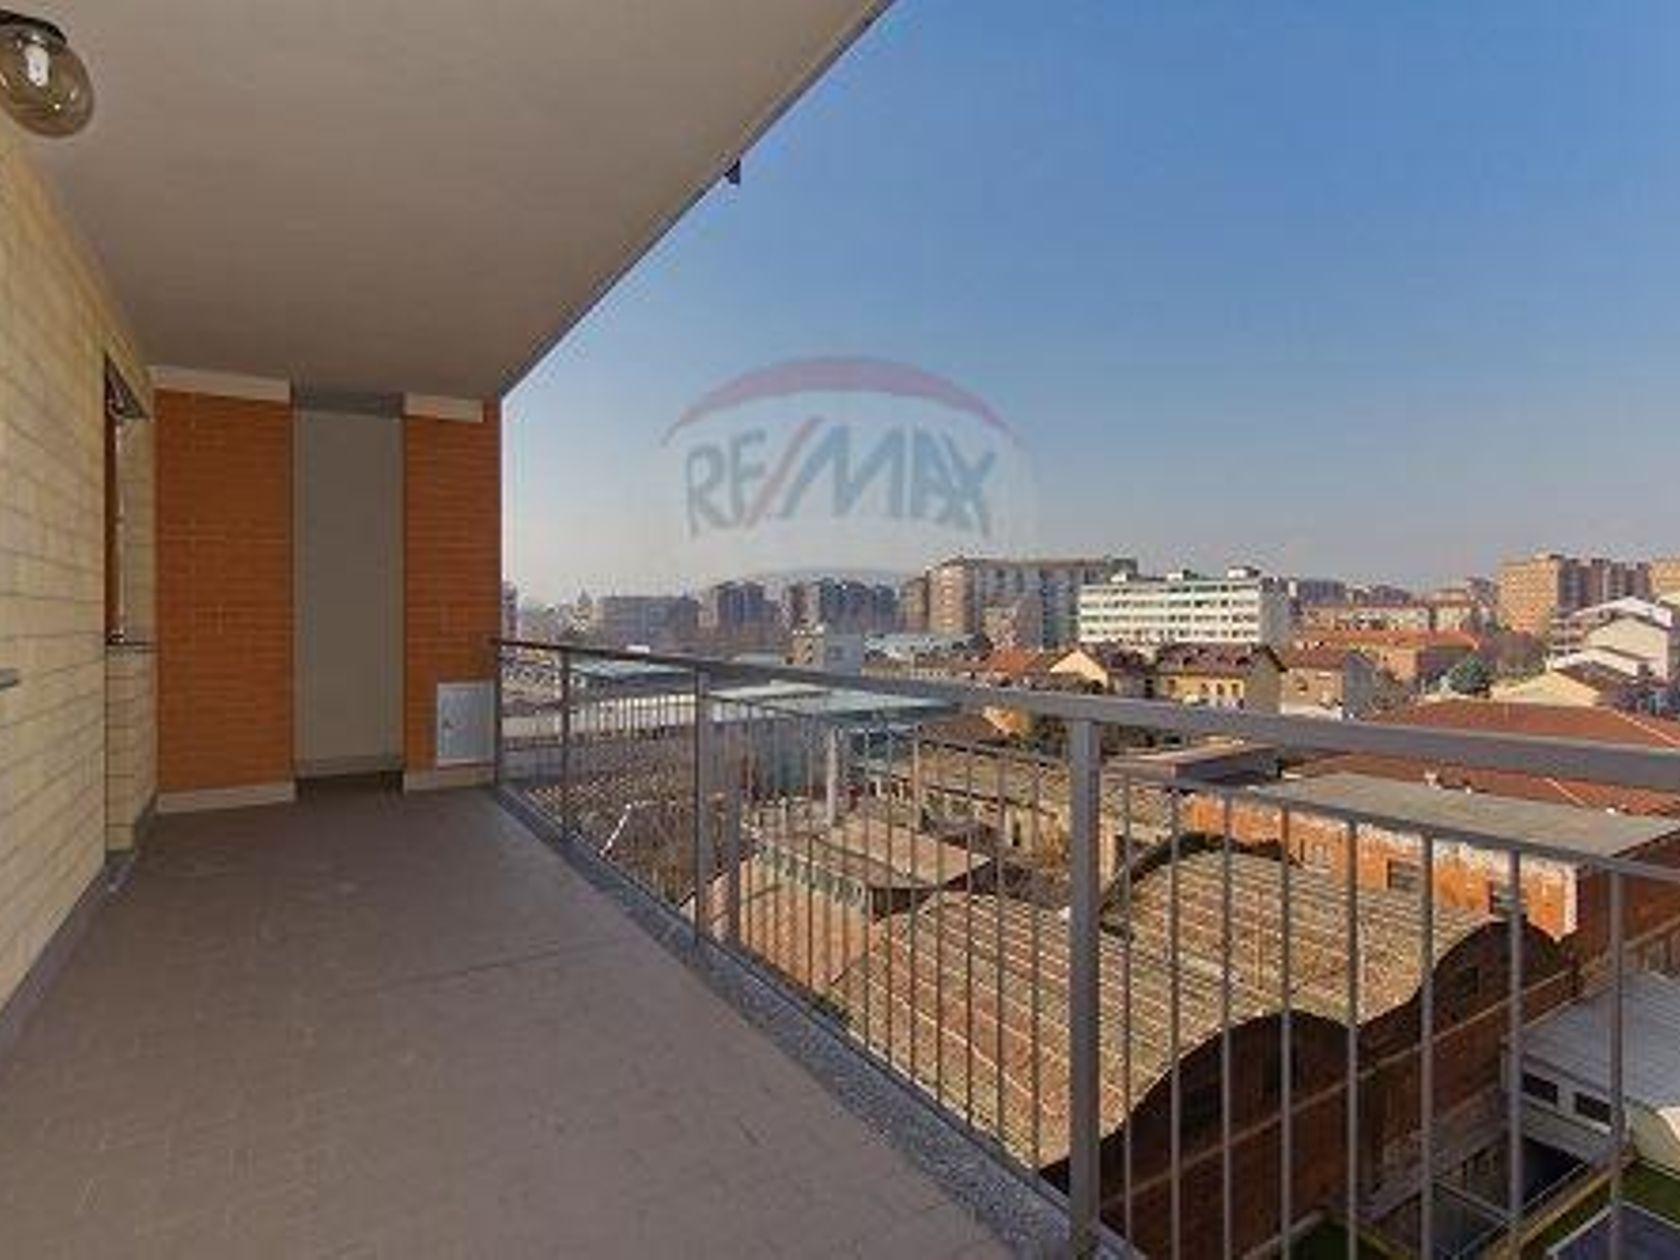 Appartamento Torino-madonna Di Campagna Borgo Vittoria Barrlanz, Torino, TO Vendita - Foto 11